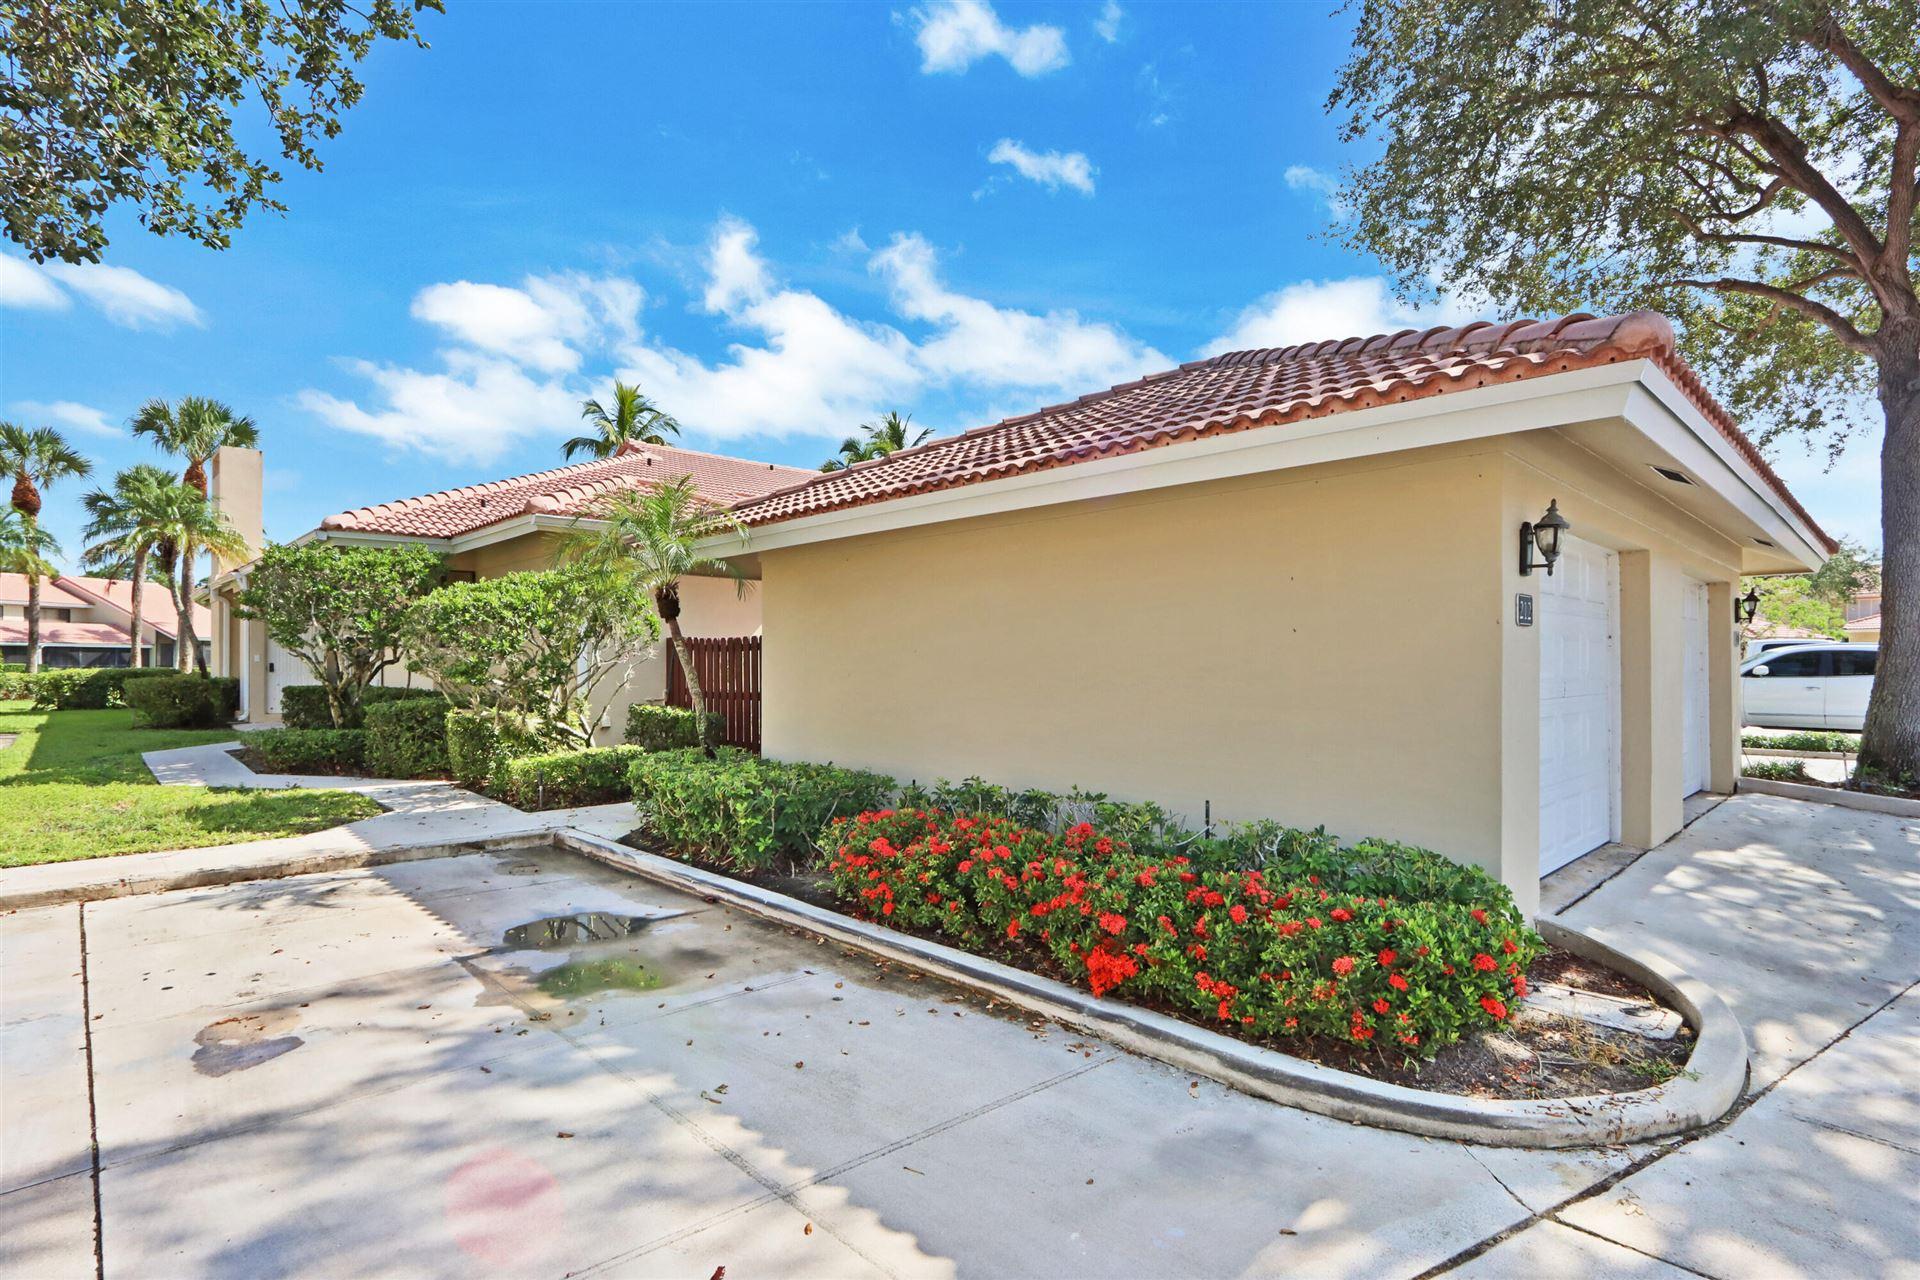 Photo of 212 Old Meadow Way, Palm Beach Gardens, FL 33418 (MLS # RX-10744087)